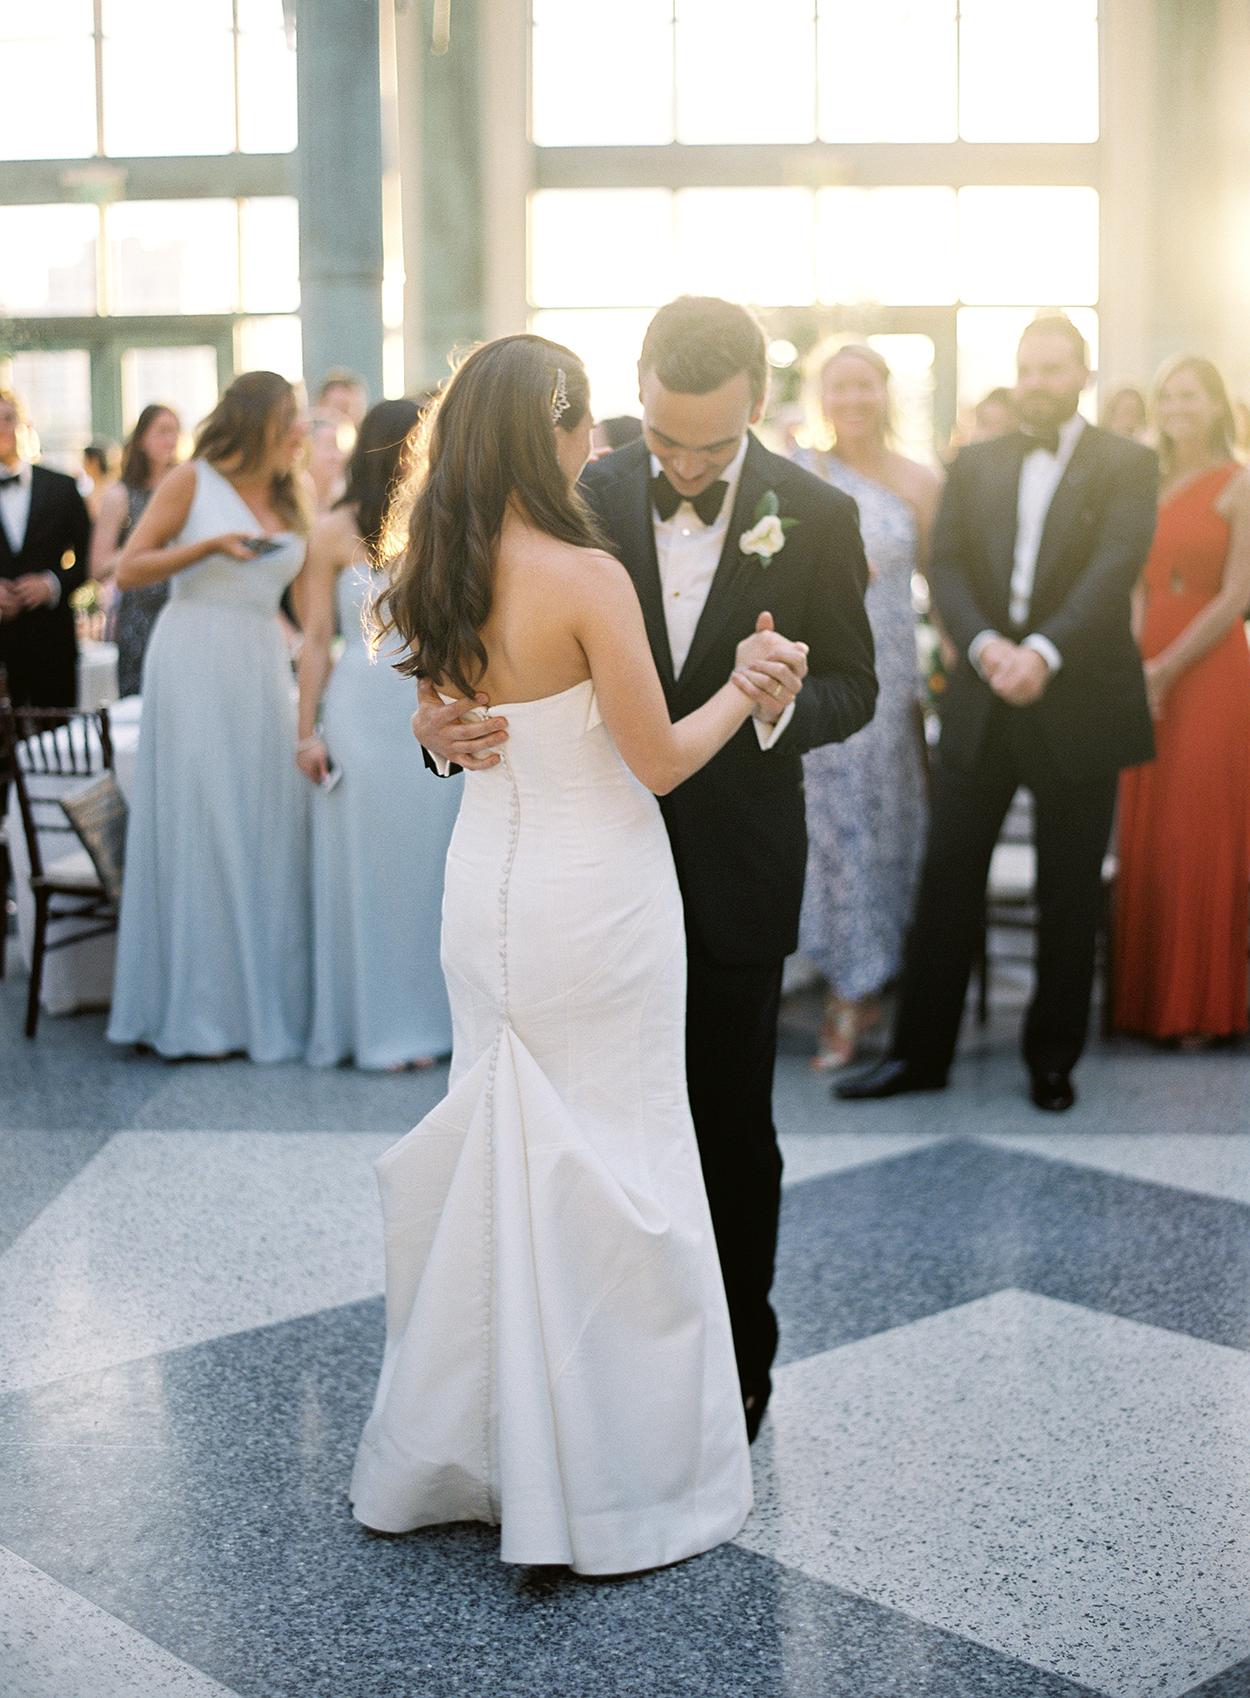 cat denis wedding first dance